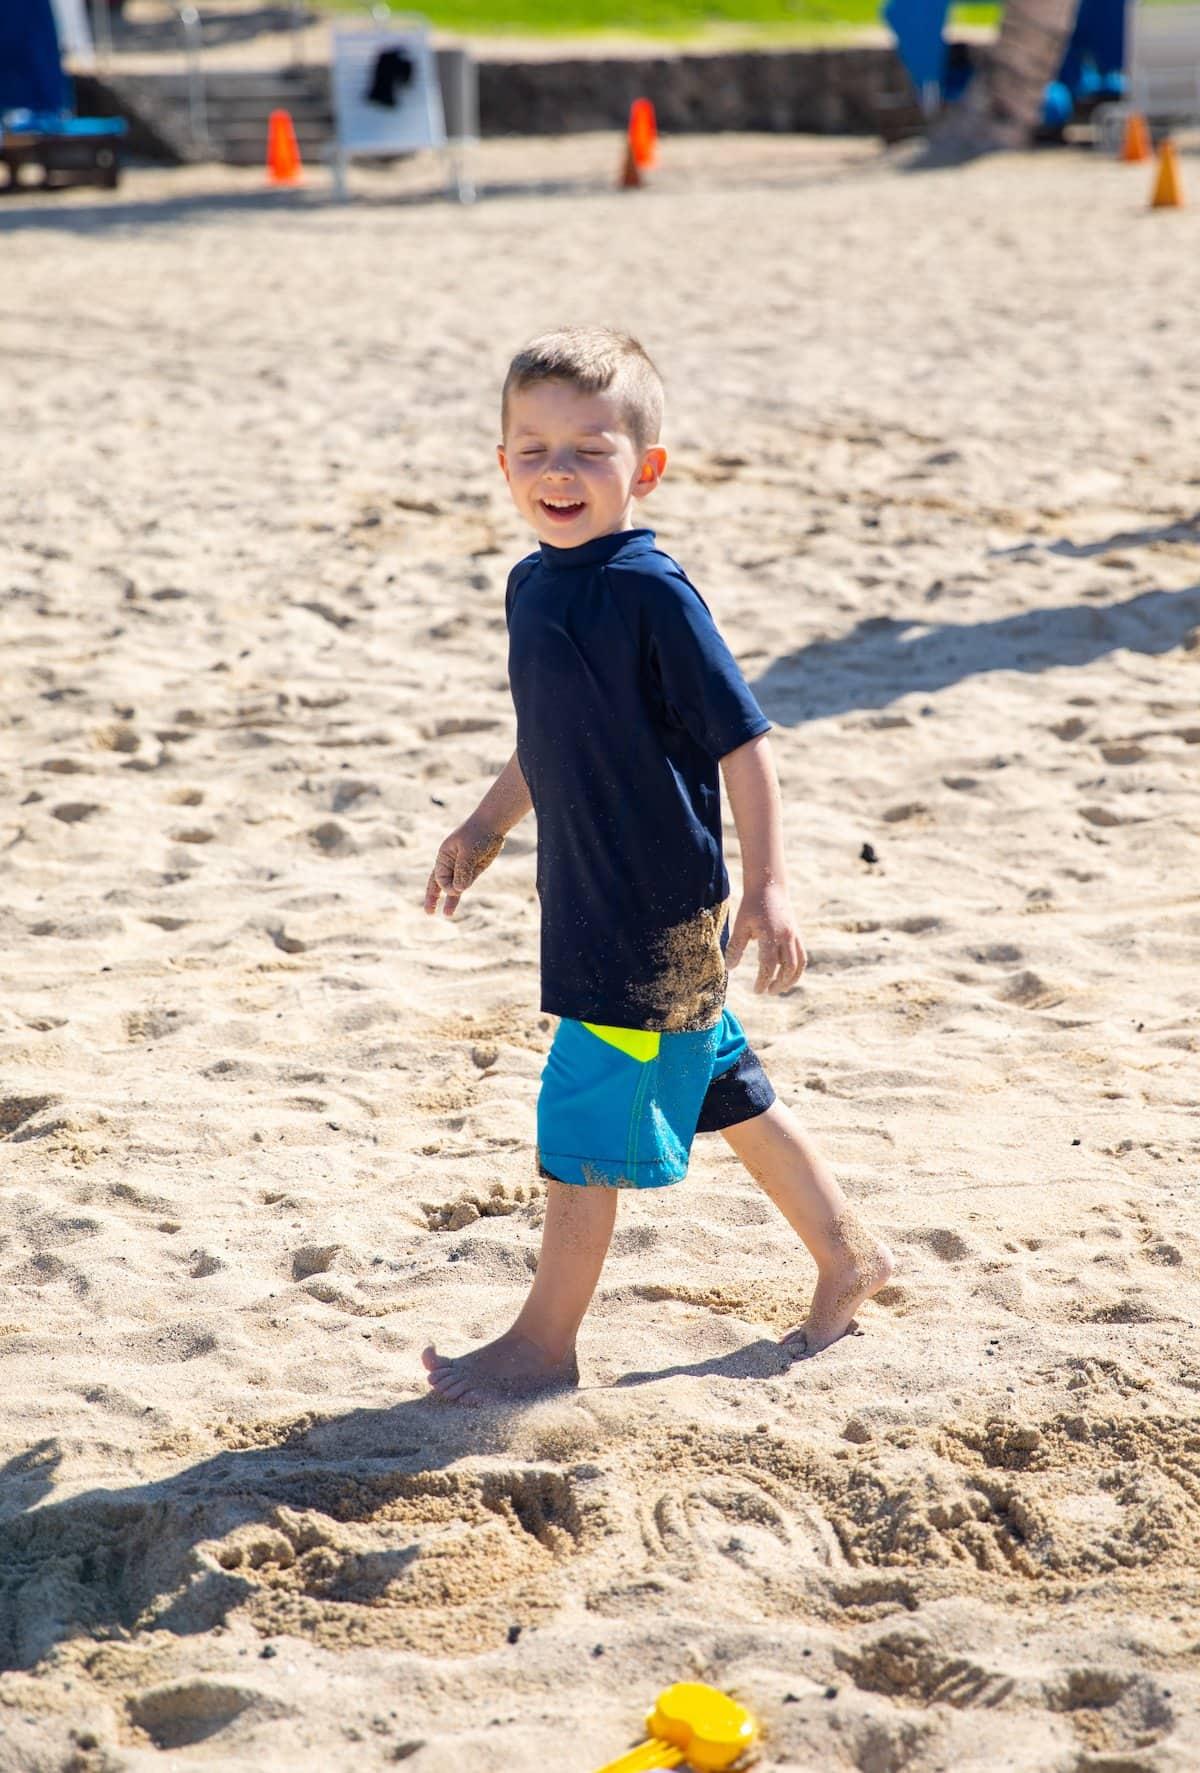 boy walking on sand